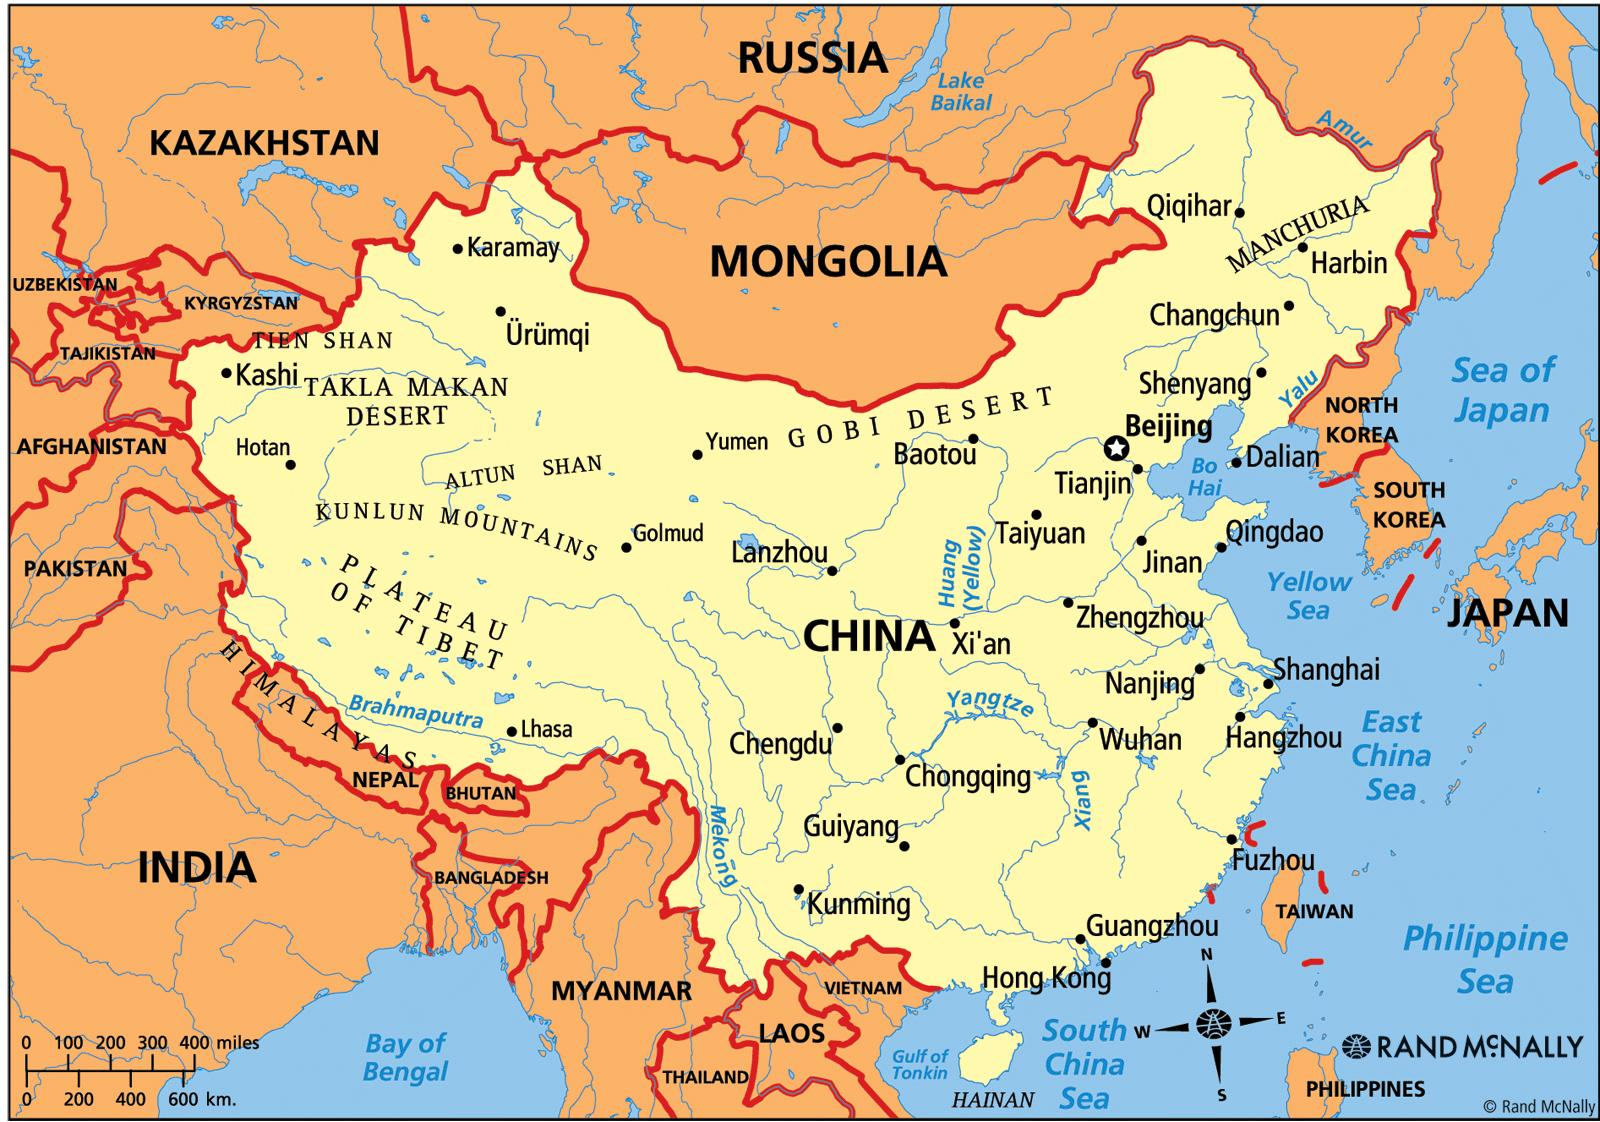 China political map - China map political (Eastern Asia - Asia)